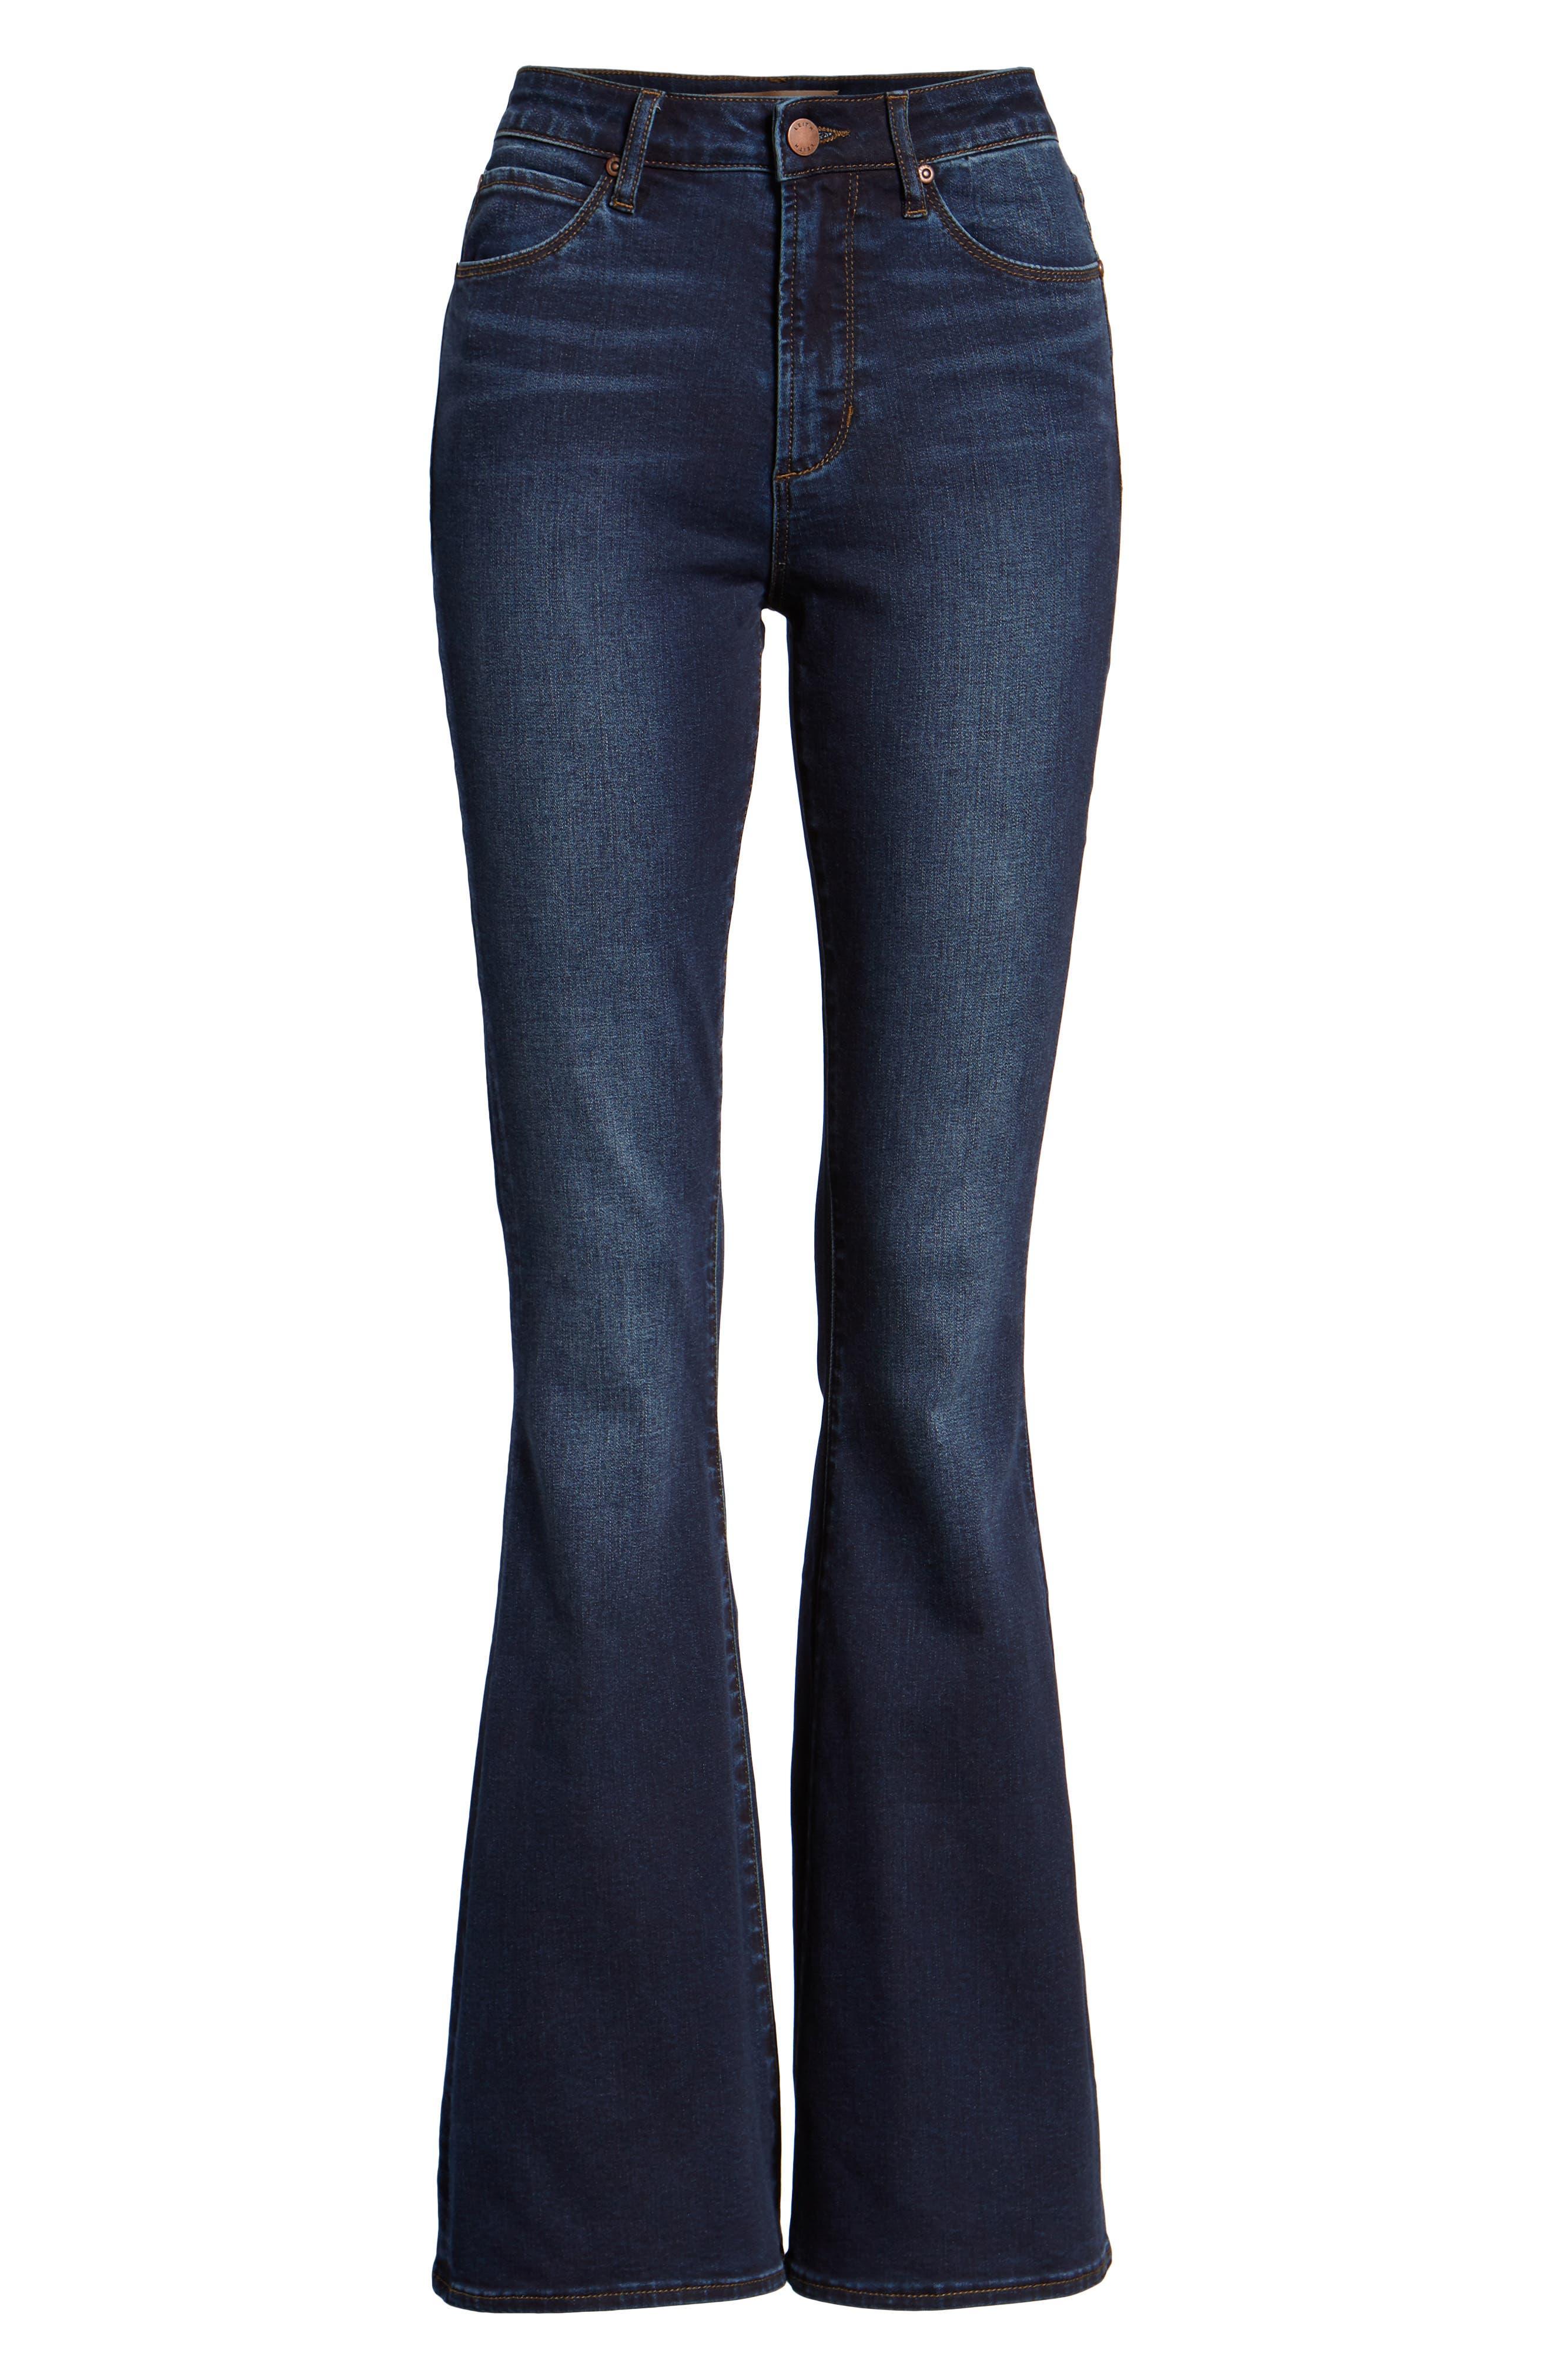 High Waist Flare Jeans,                             Alternate thumbnail 7, color,                             MEDIUM WASH